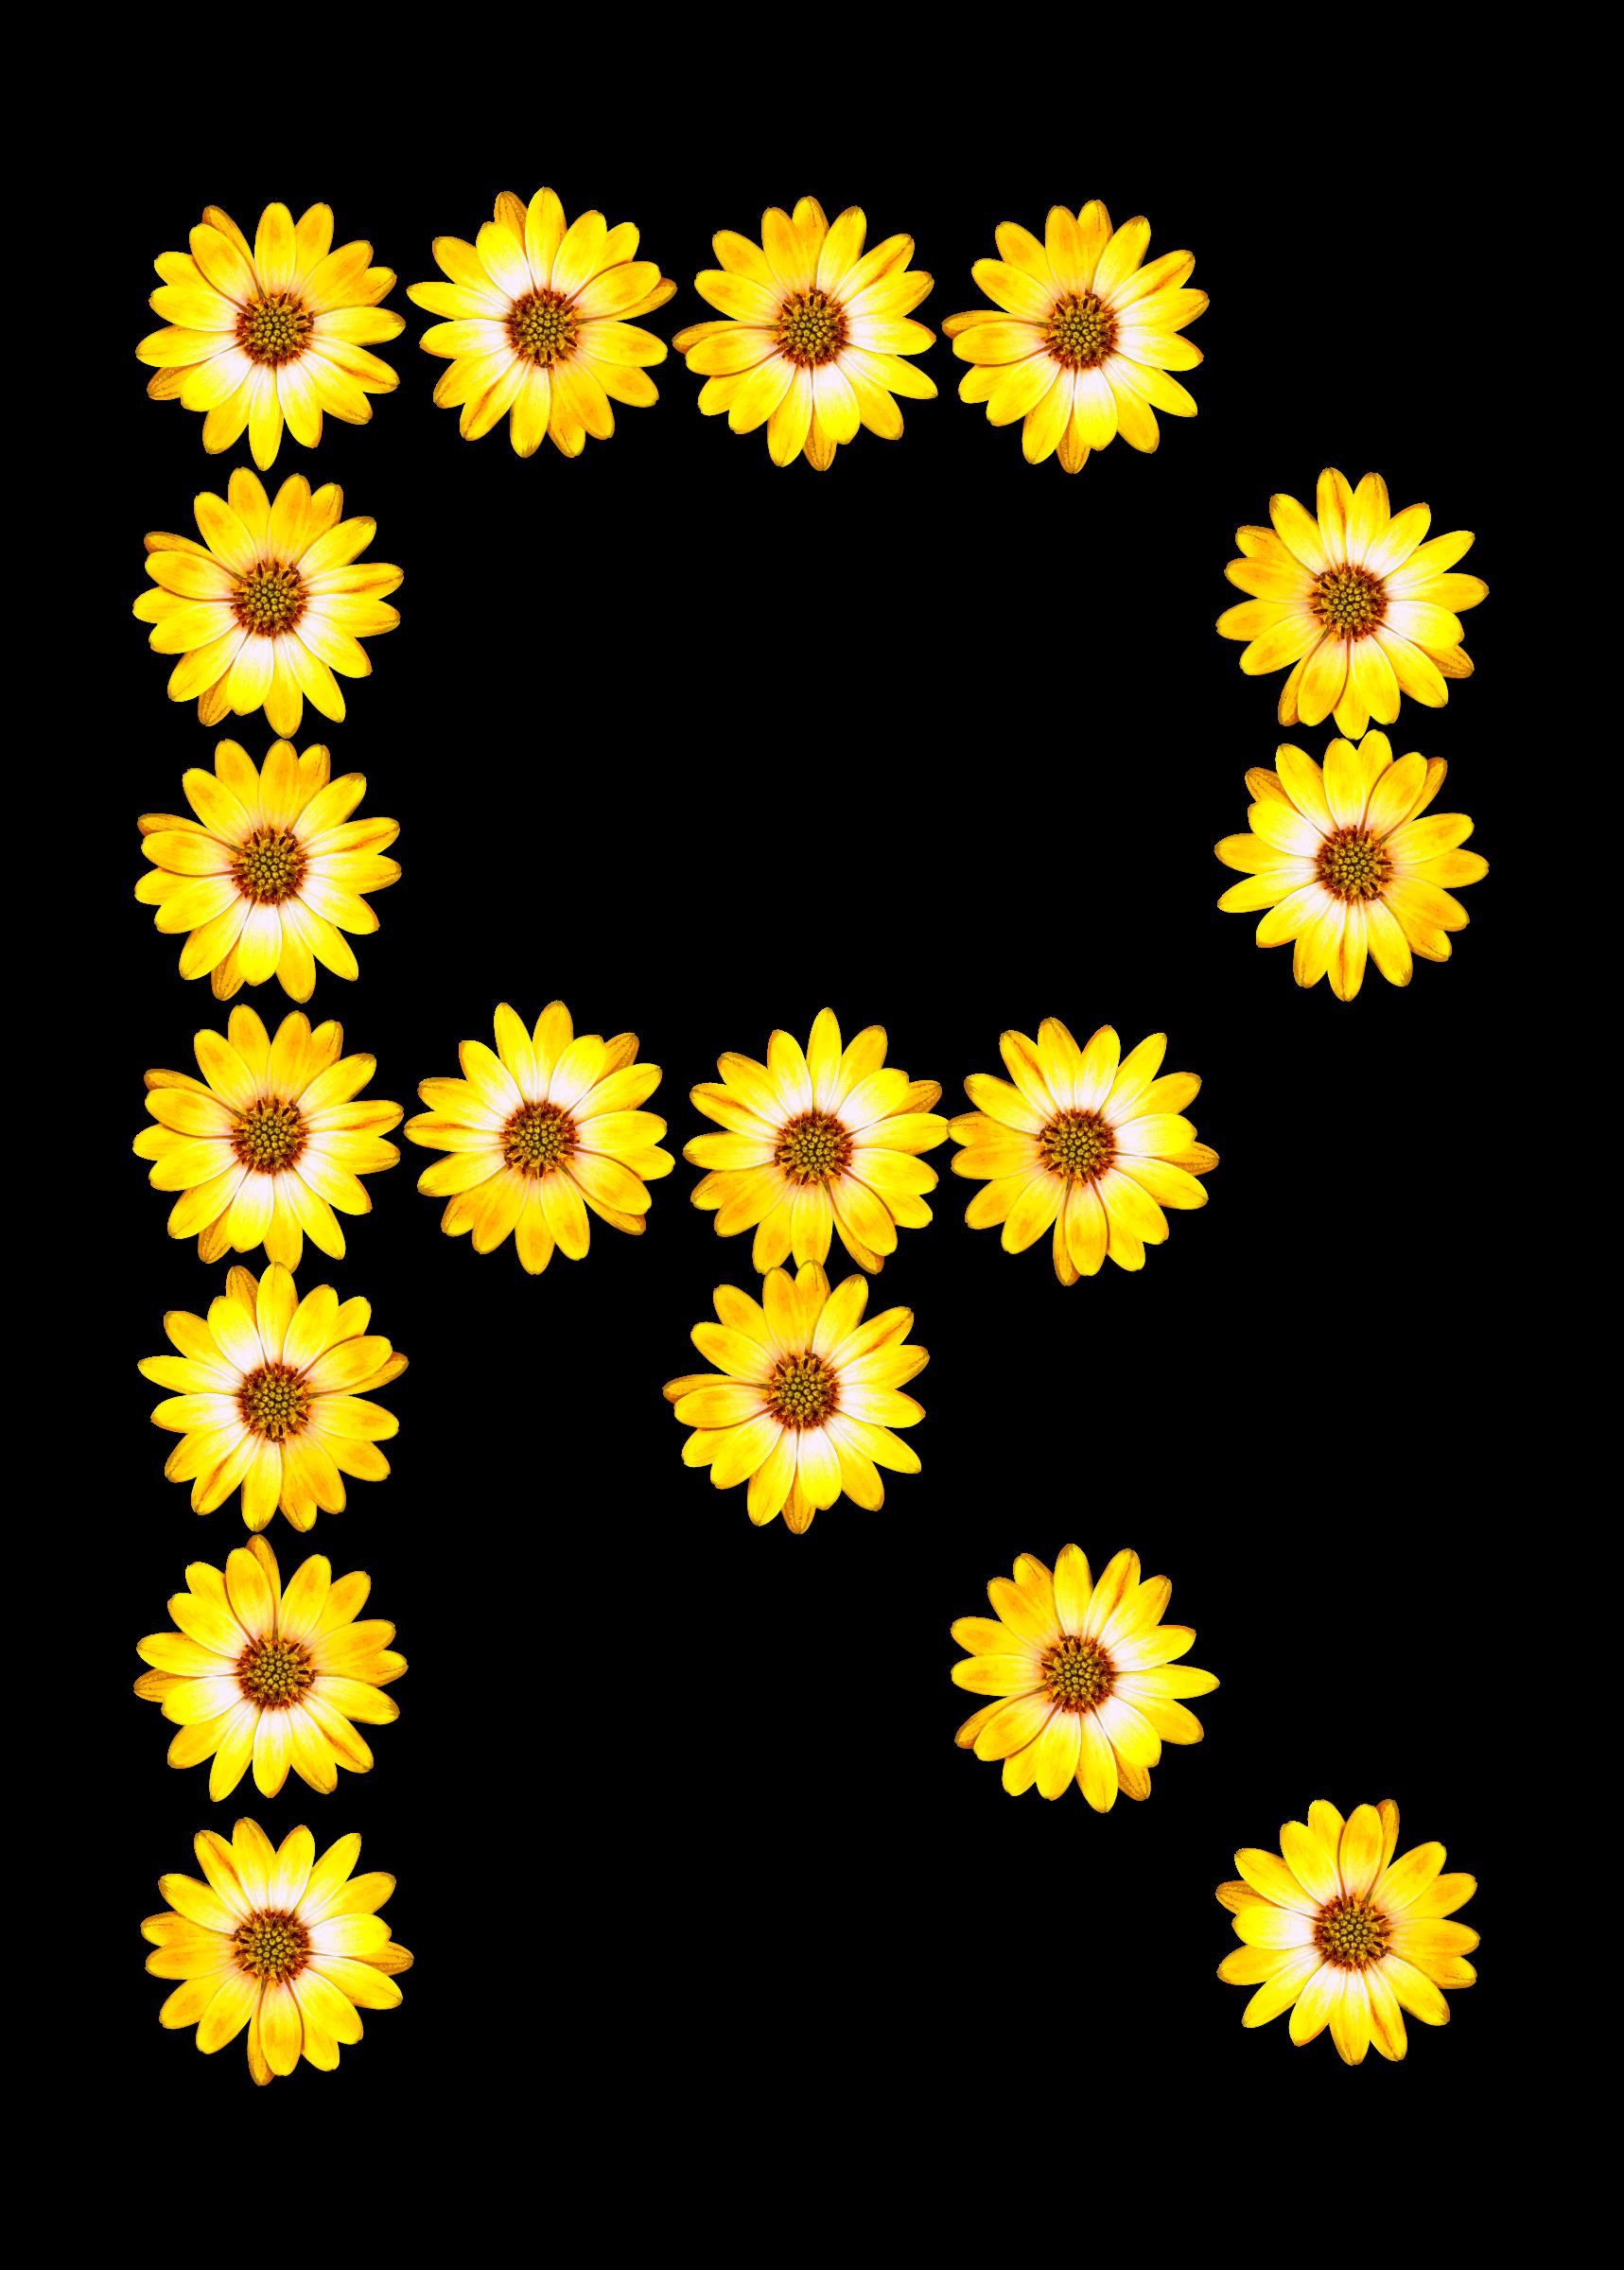 Floral alphabet r big. Daisies clipart smiley